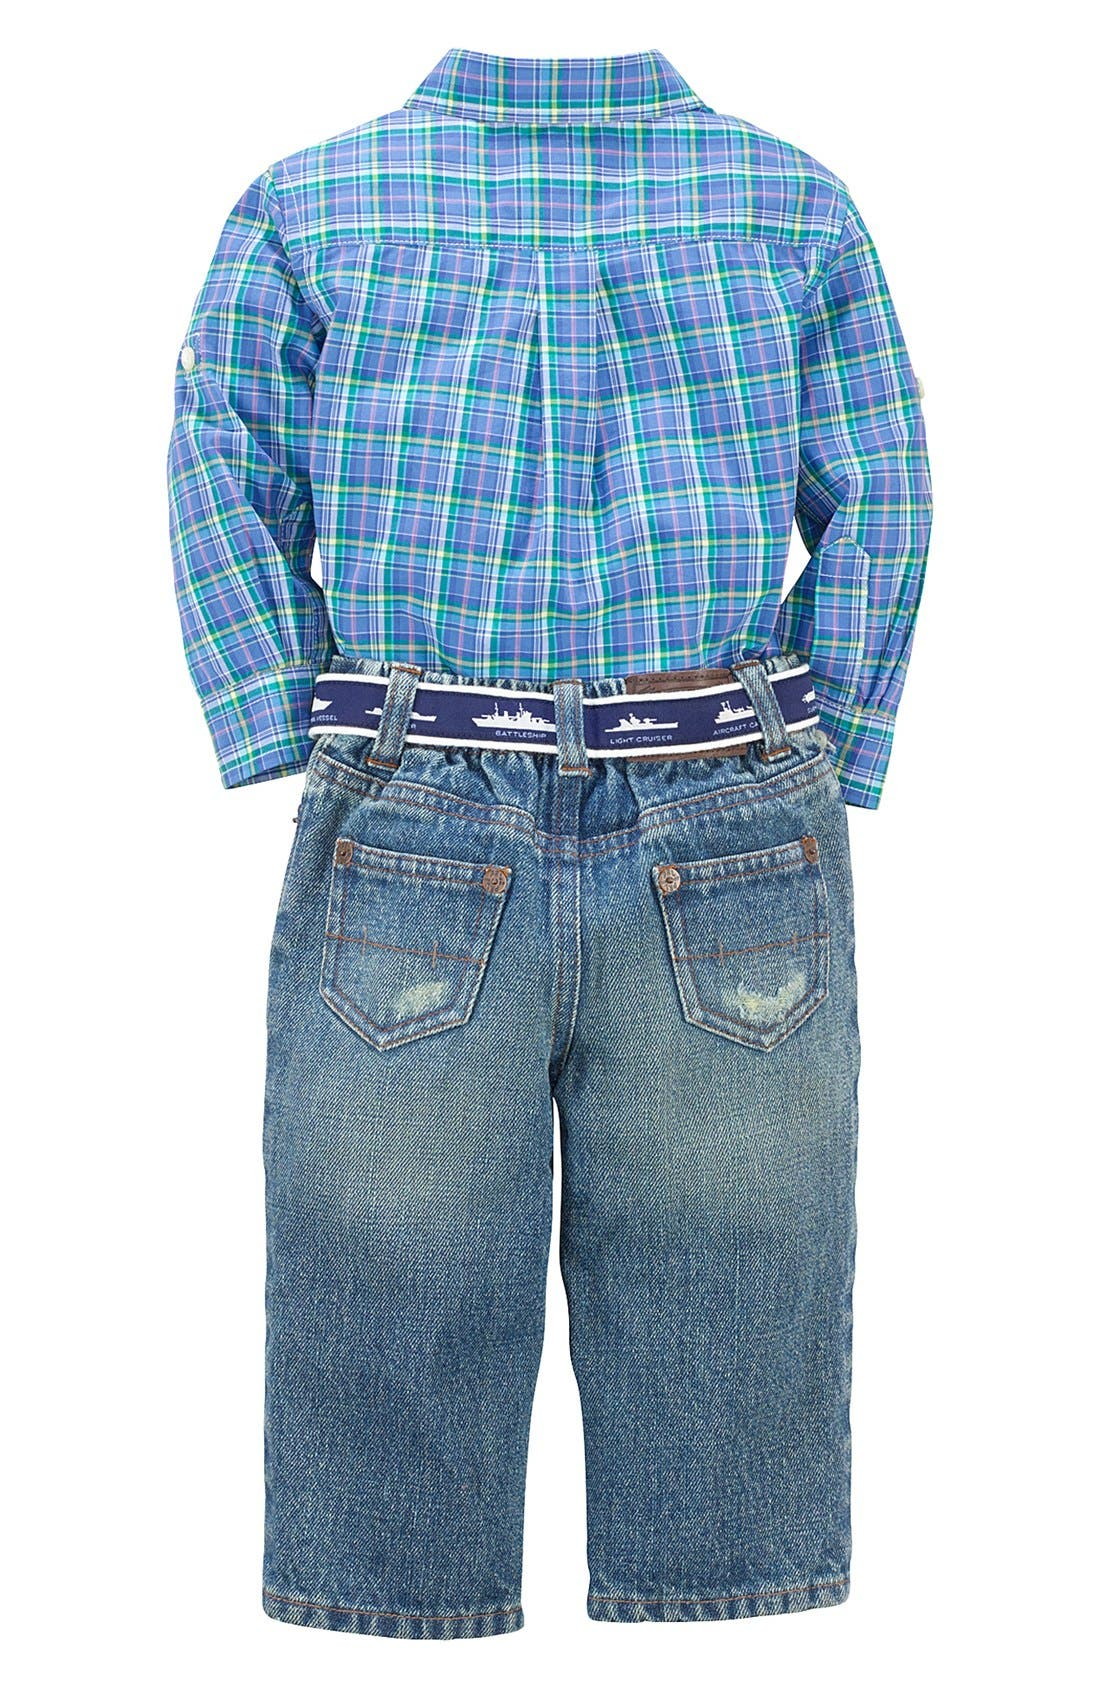 Alternate Image 2  - Ralph Lauren Plaid Sport Shirt & Jeans (Baby Boys)